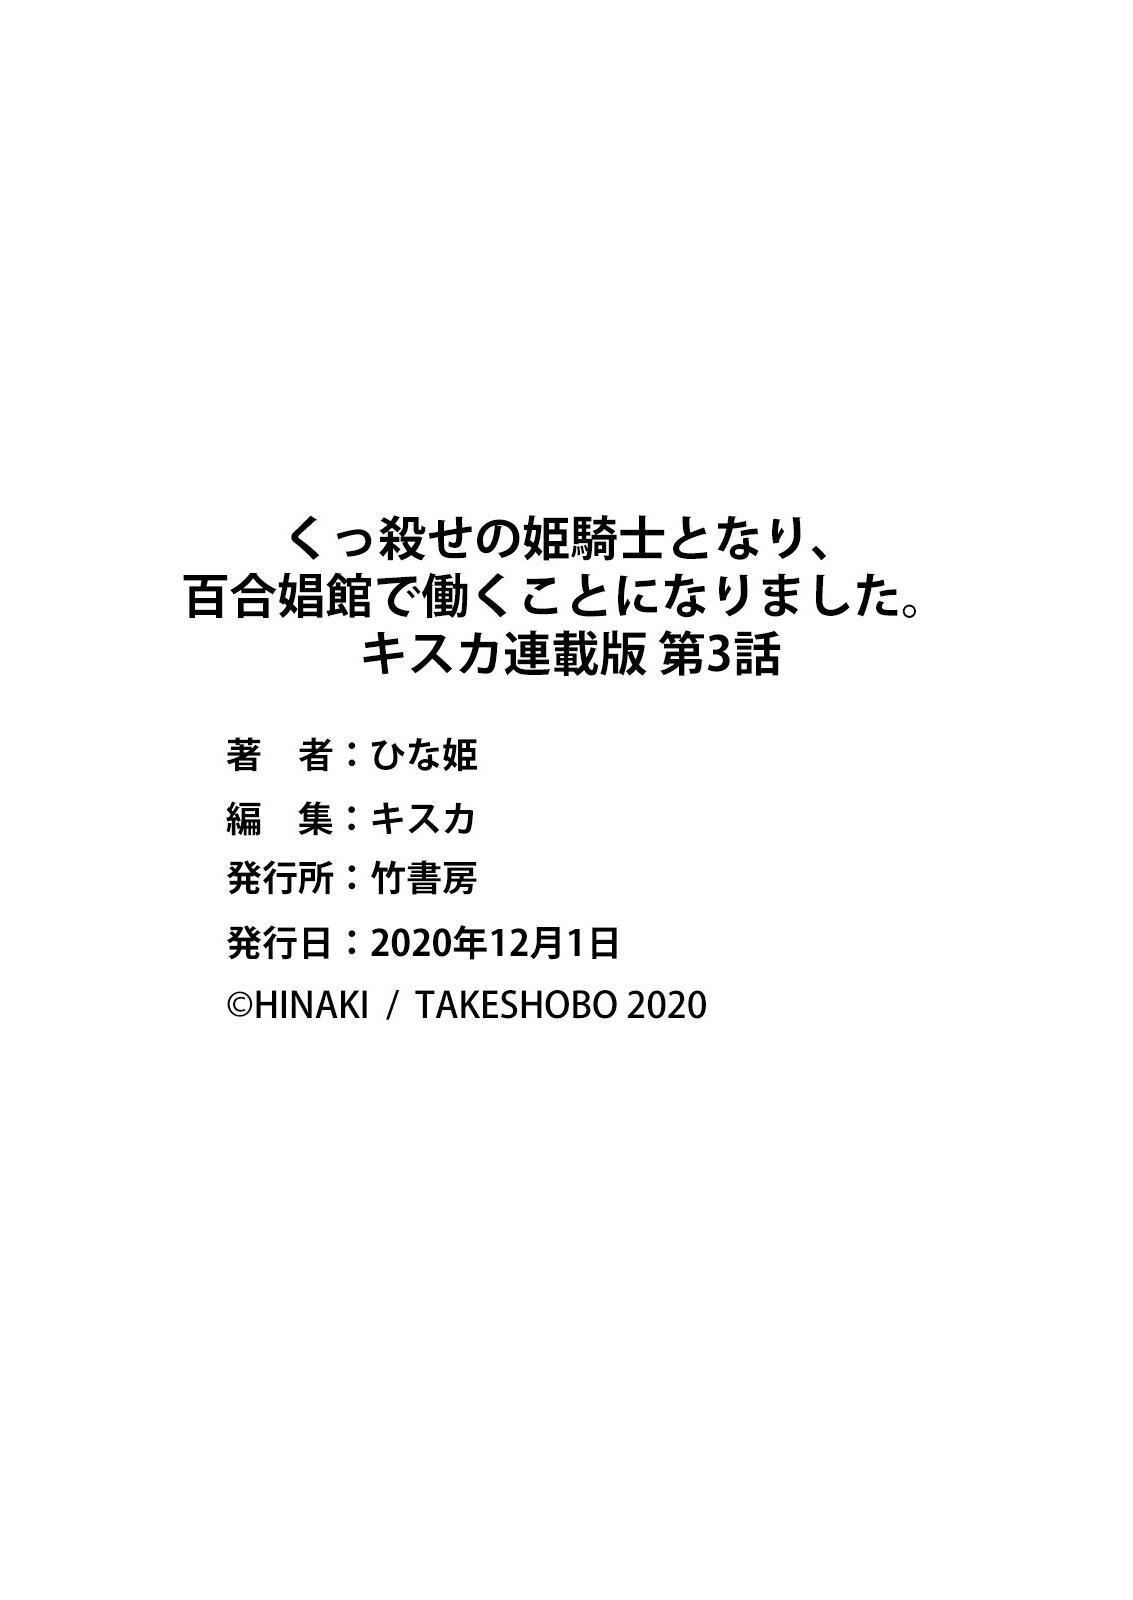 kuxtu koro se no hime kisi to nari, yuri syoukan de hatara ku koto ni nari masi ta. 3 (chinese)(鬼畜王汉化组) 21